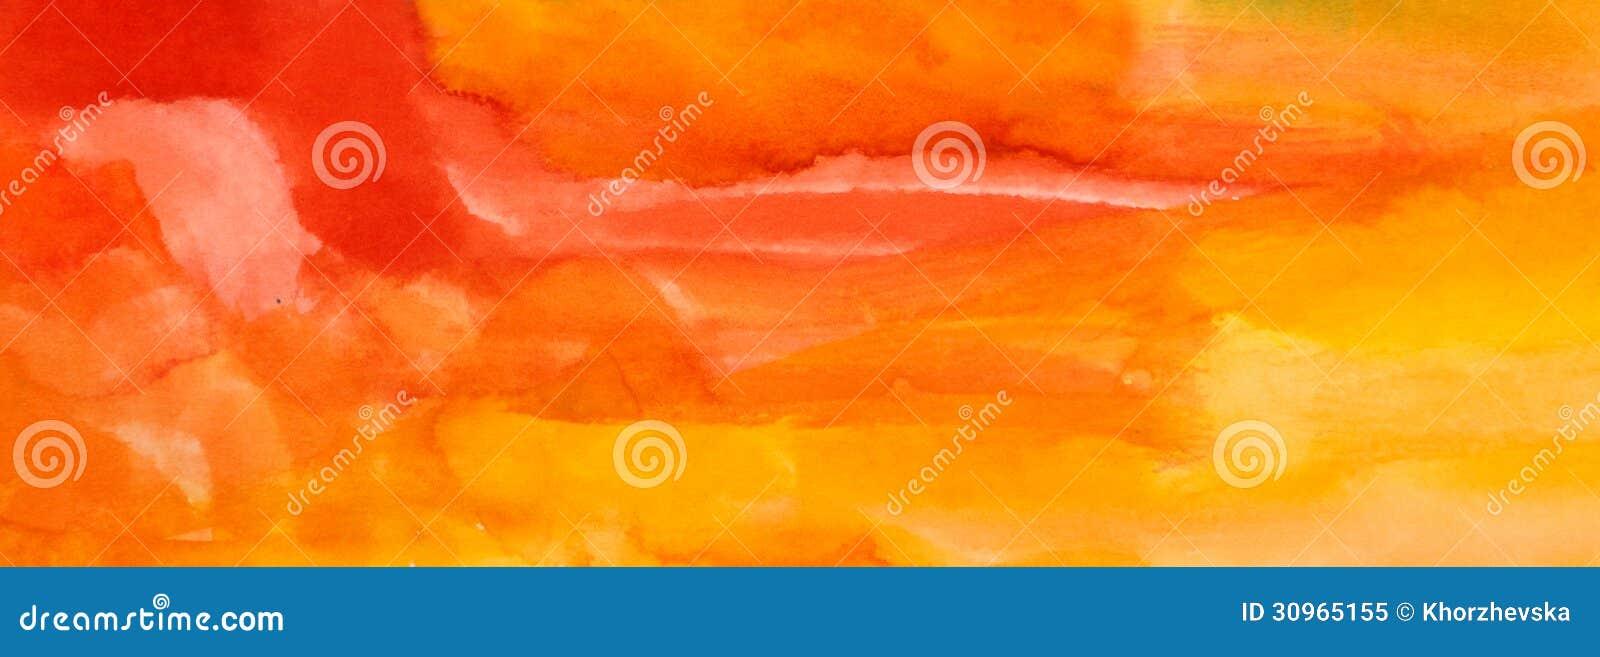 Banner Orange Background Childish Art Drawing Royalty Free Stock Photo ...